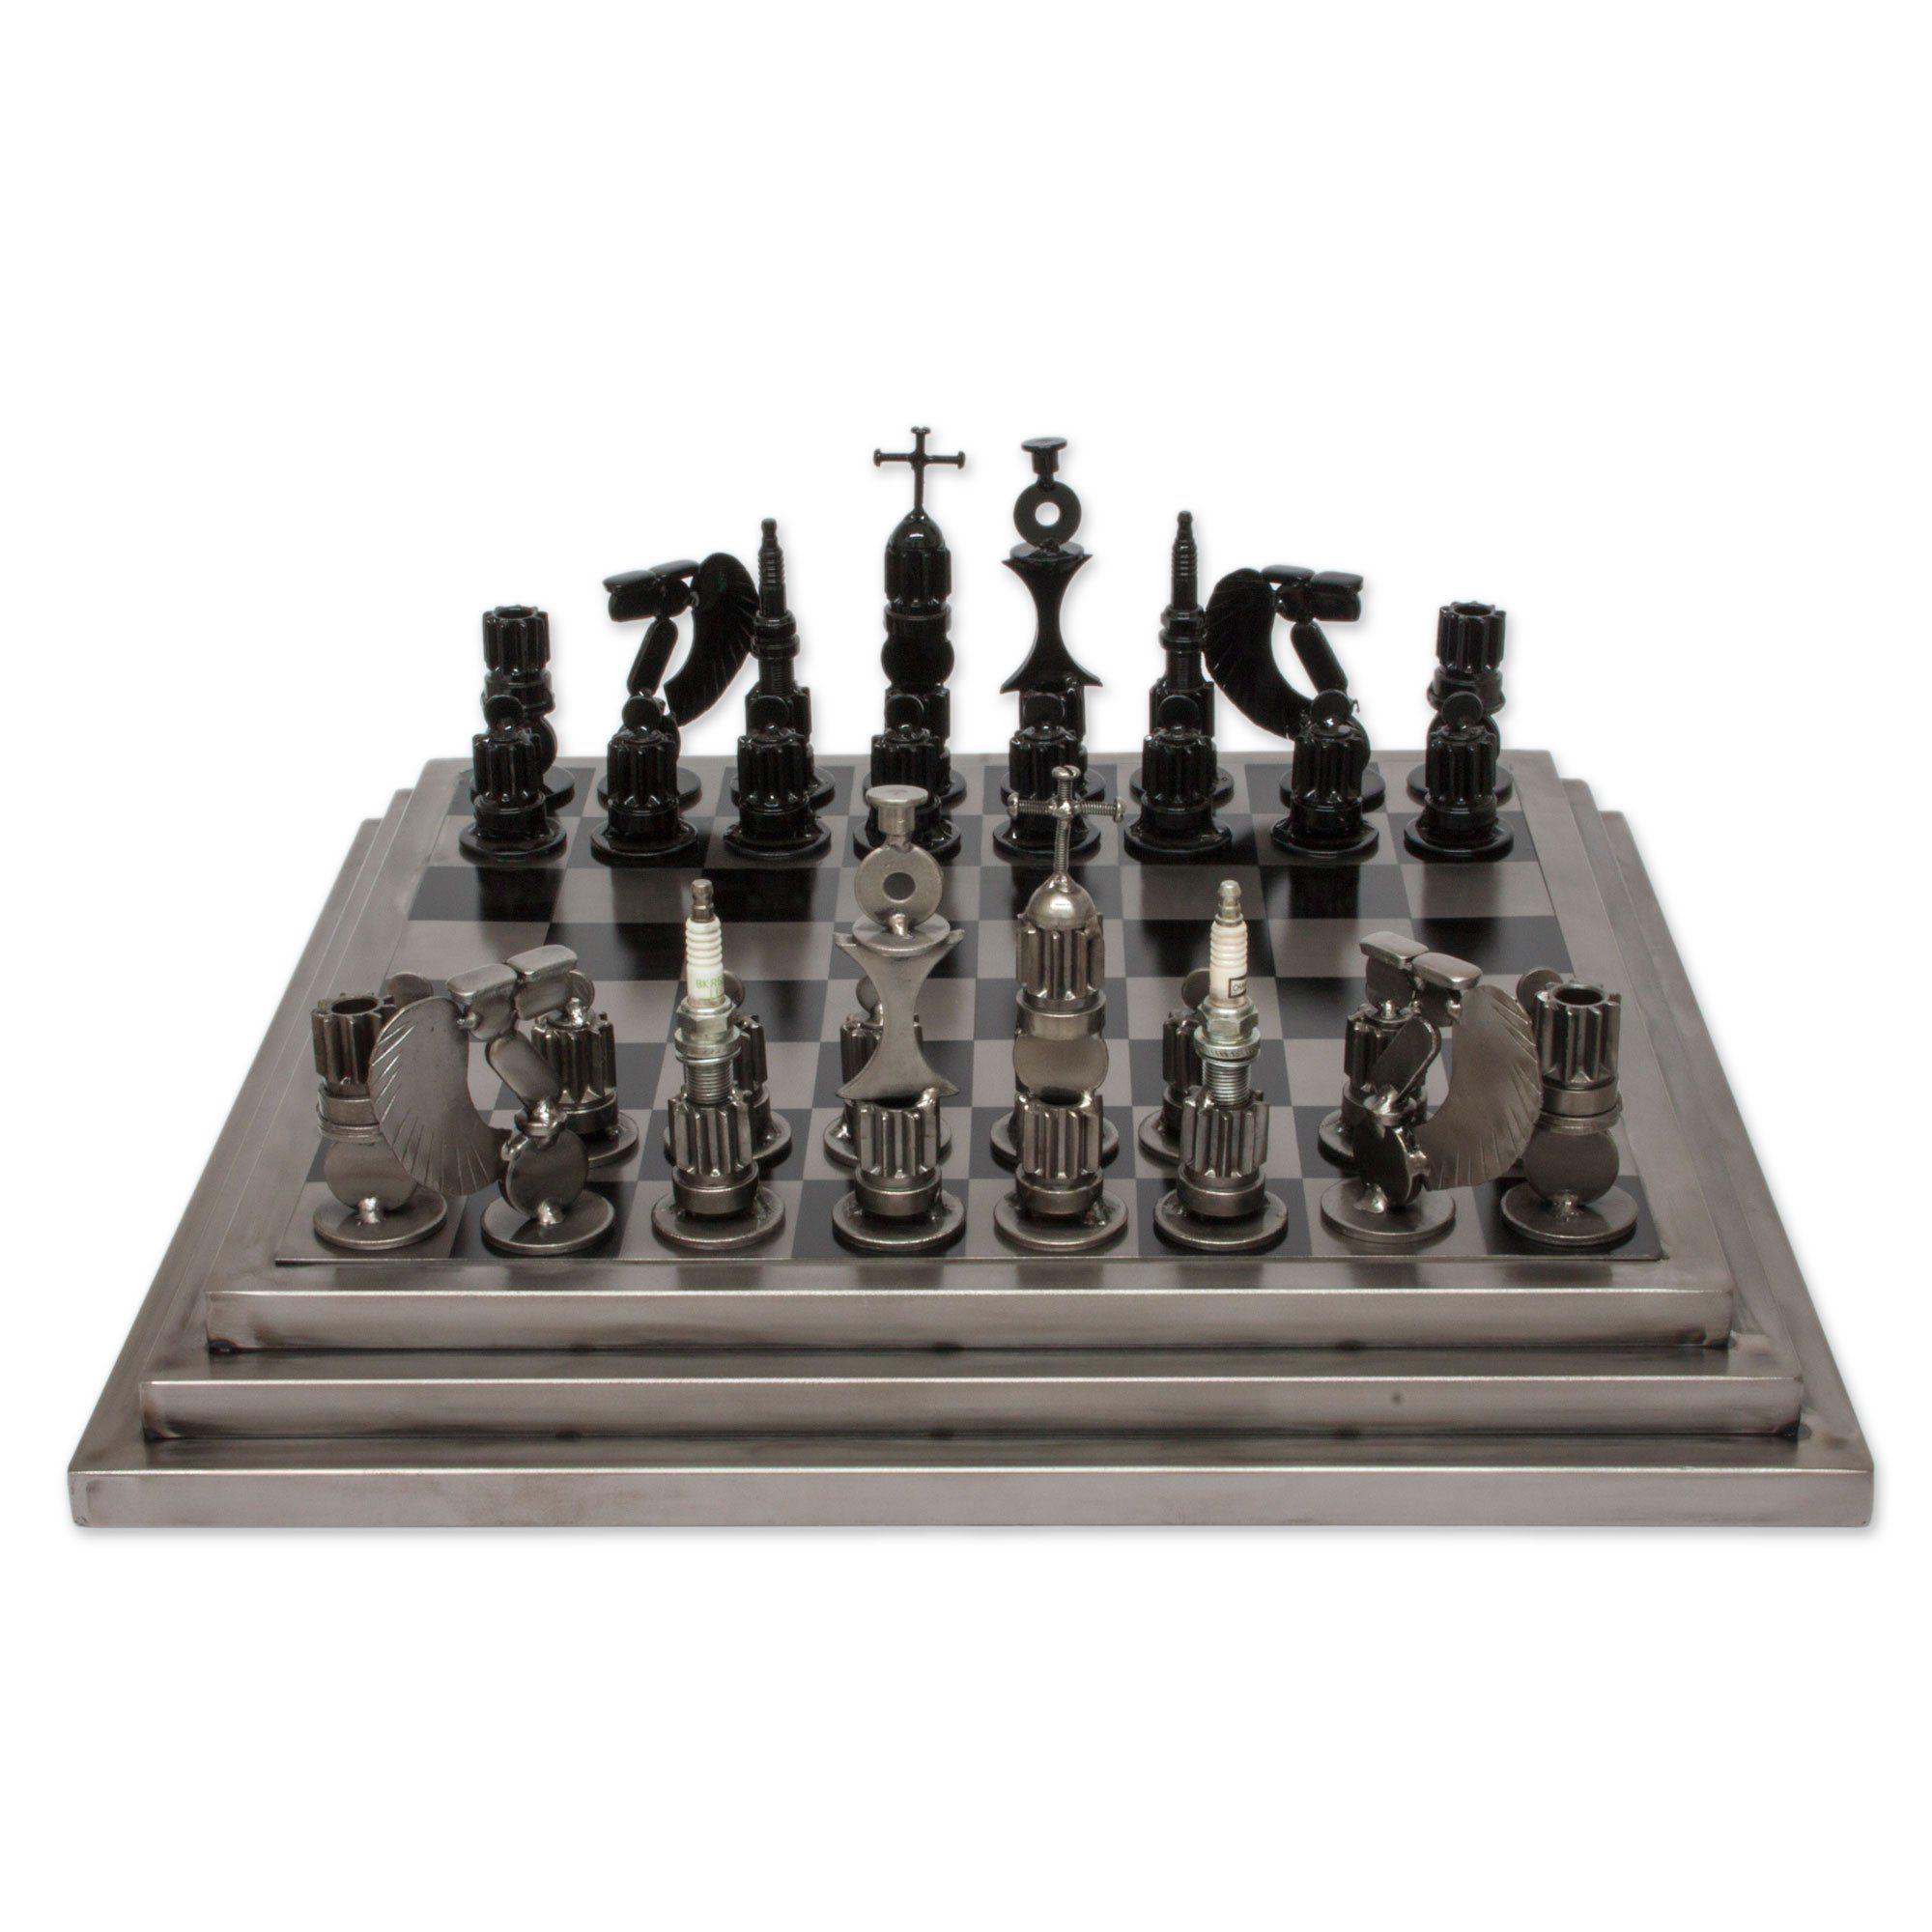 Steel Chess Set Novica Rustic Steel Chess Set Metallic 'rustic Warriors'  Home